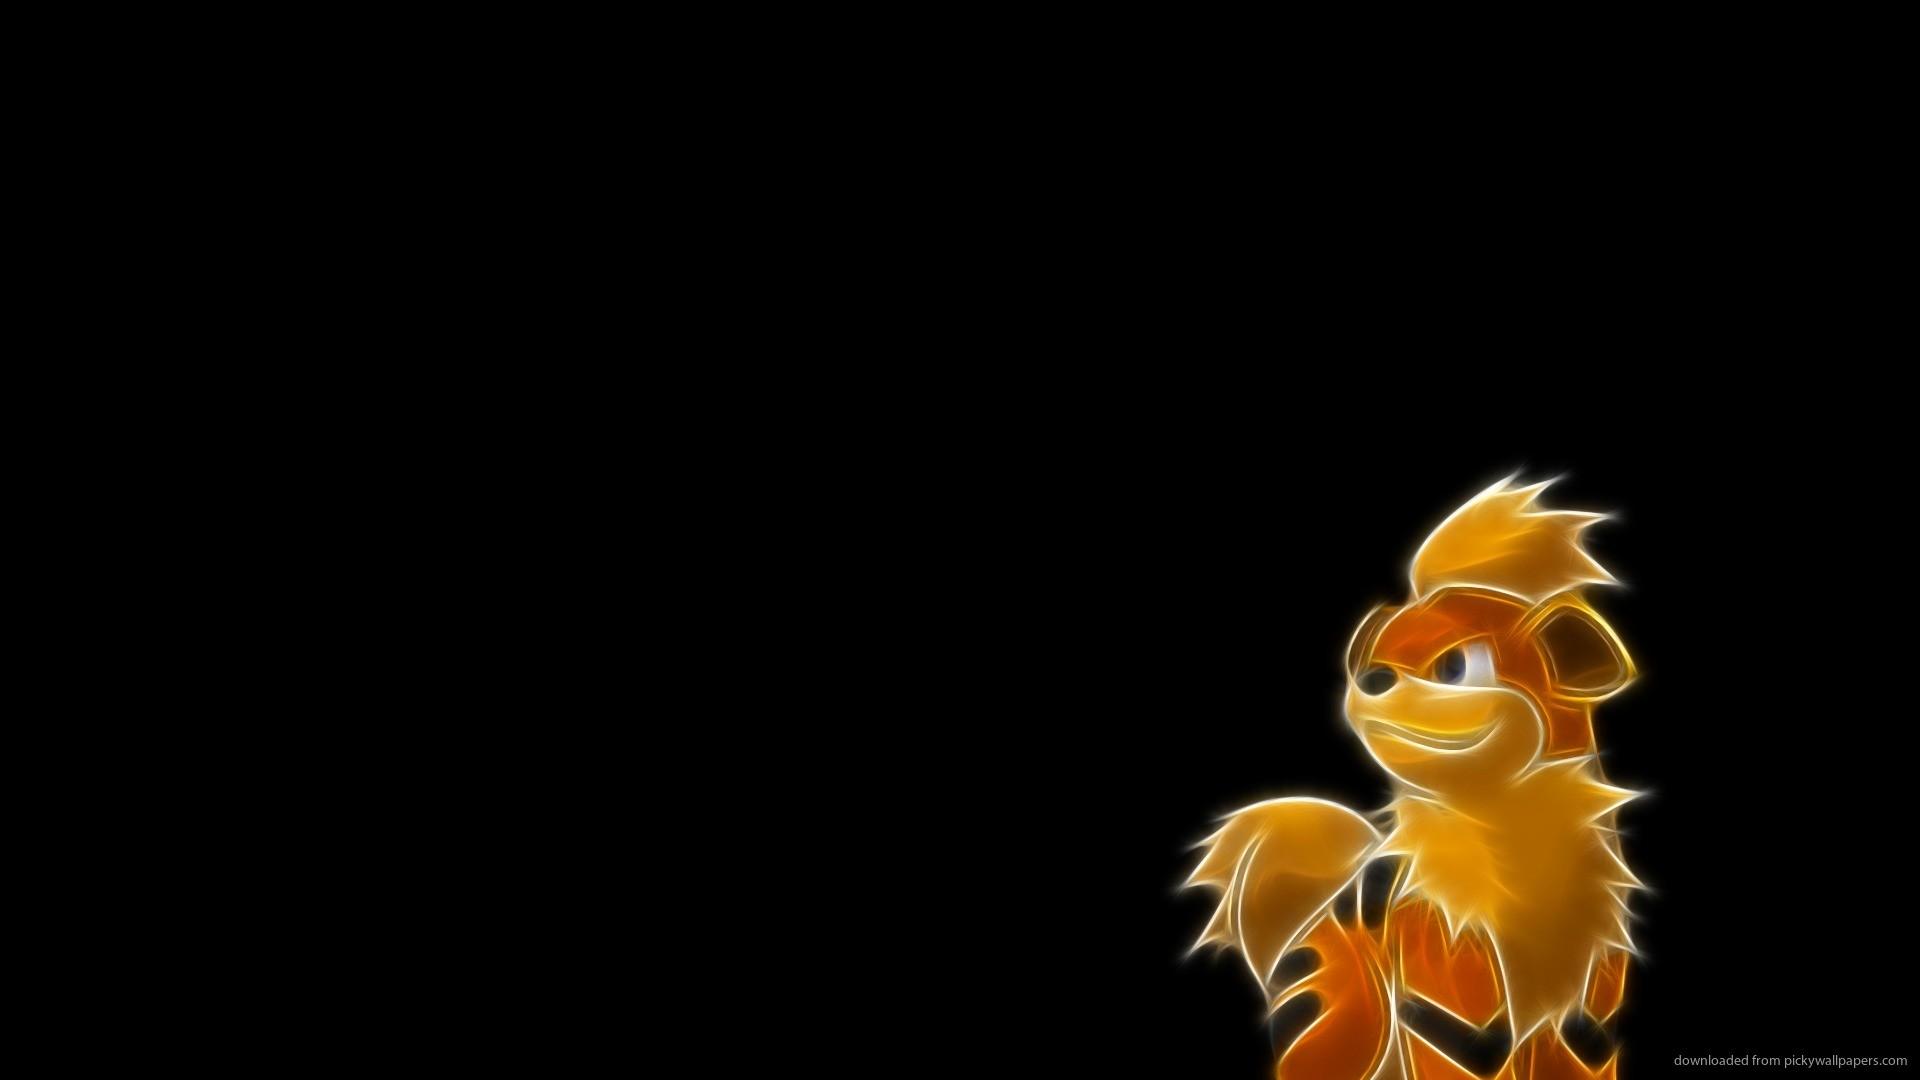 Growlithe Pokemon Wallpaper picture